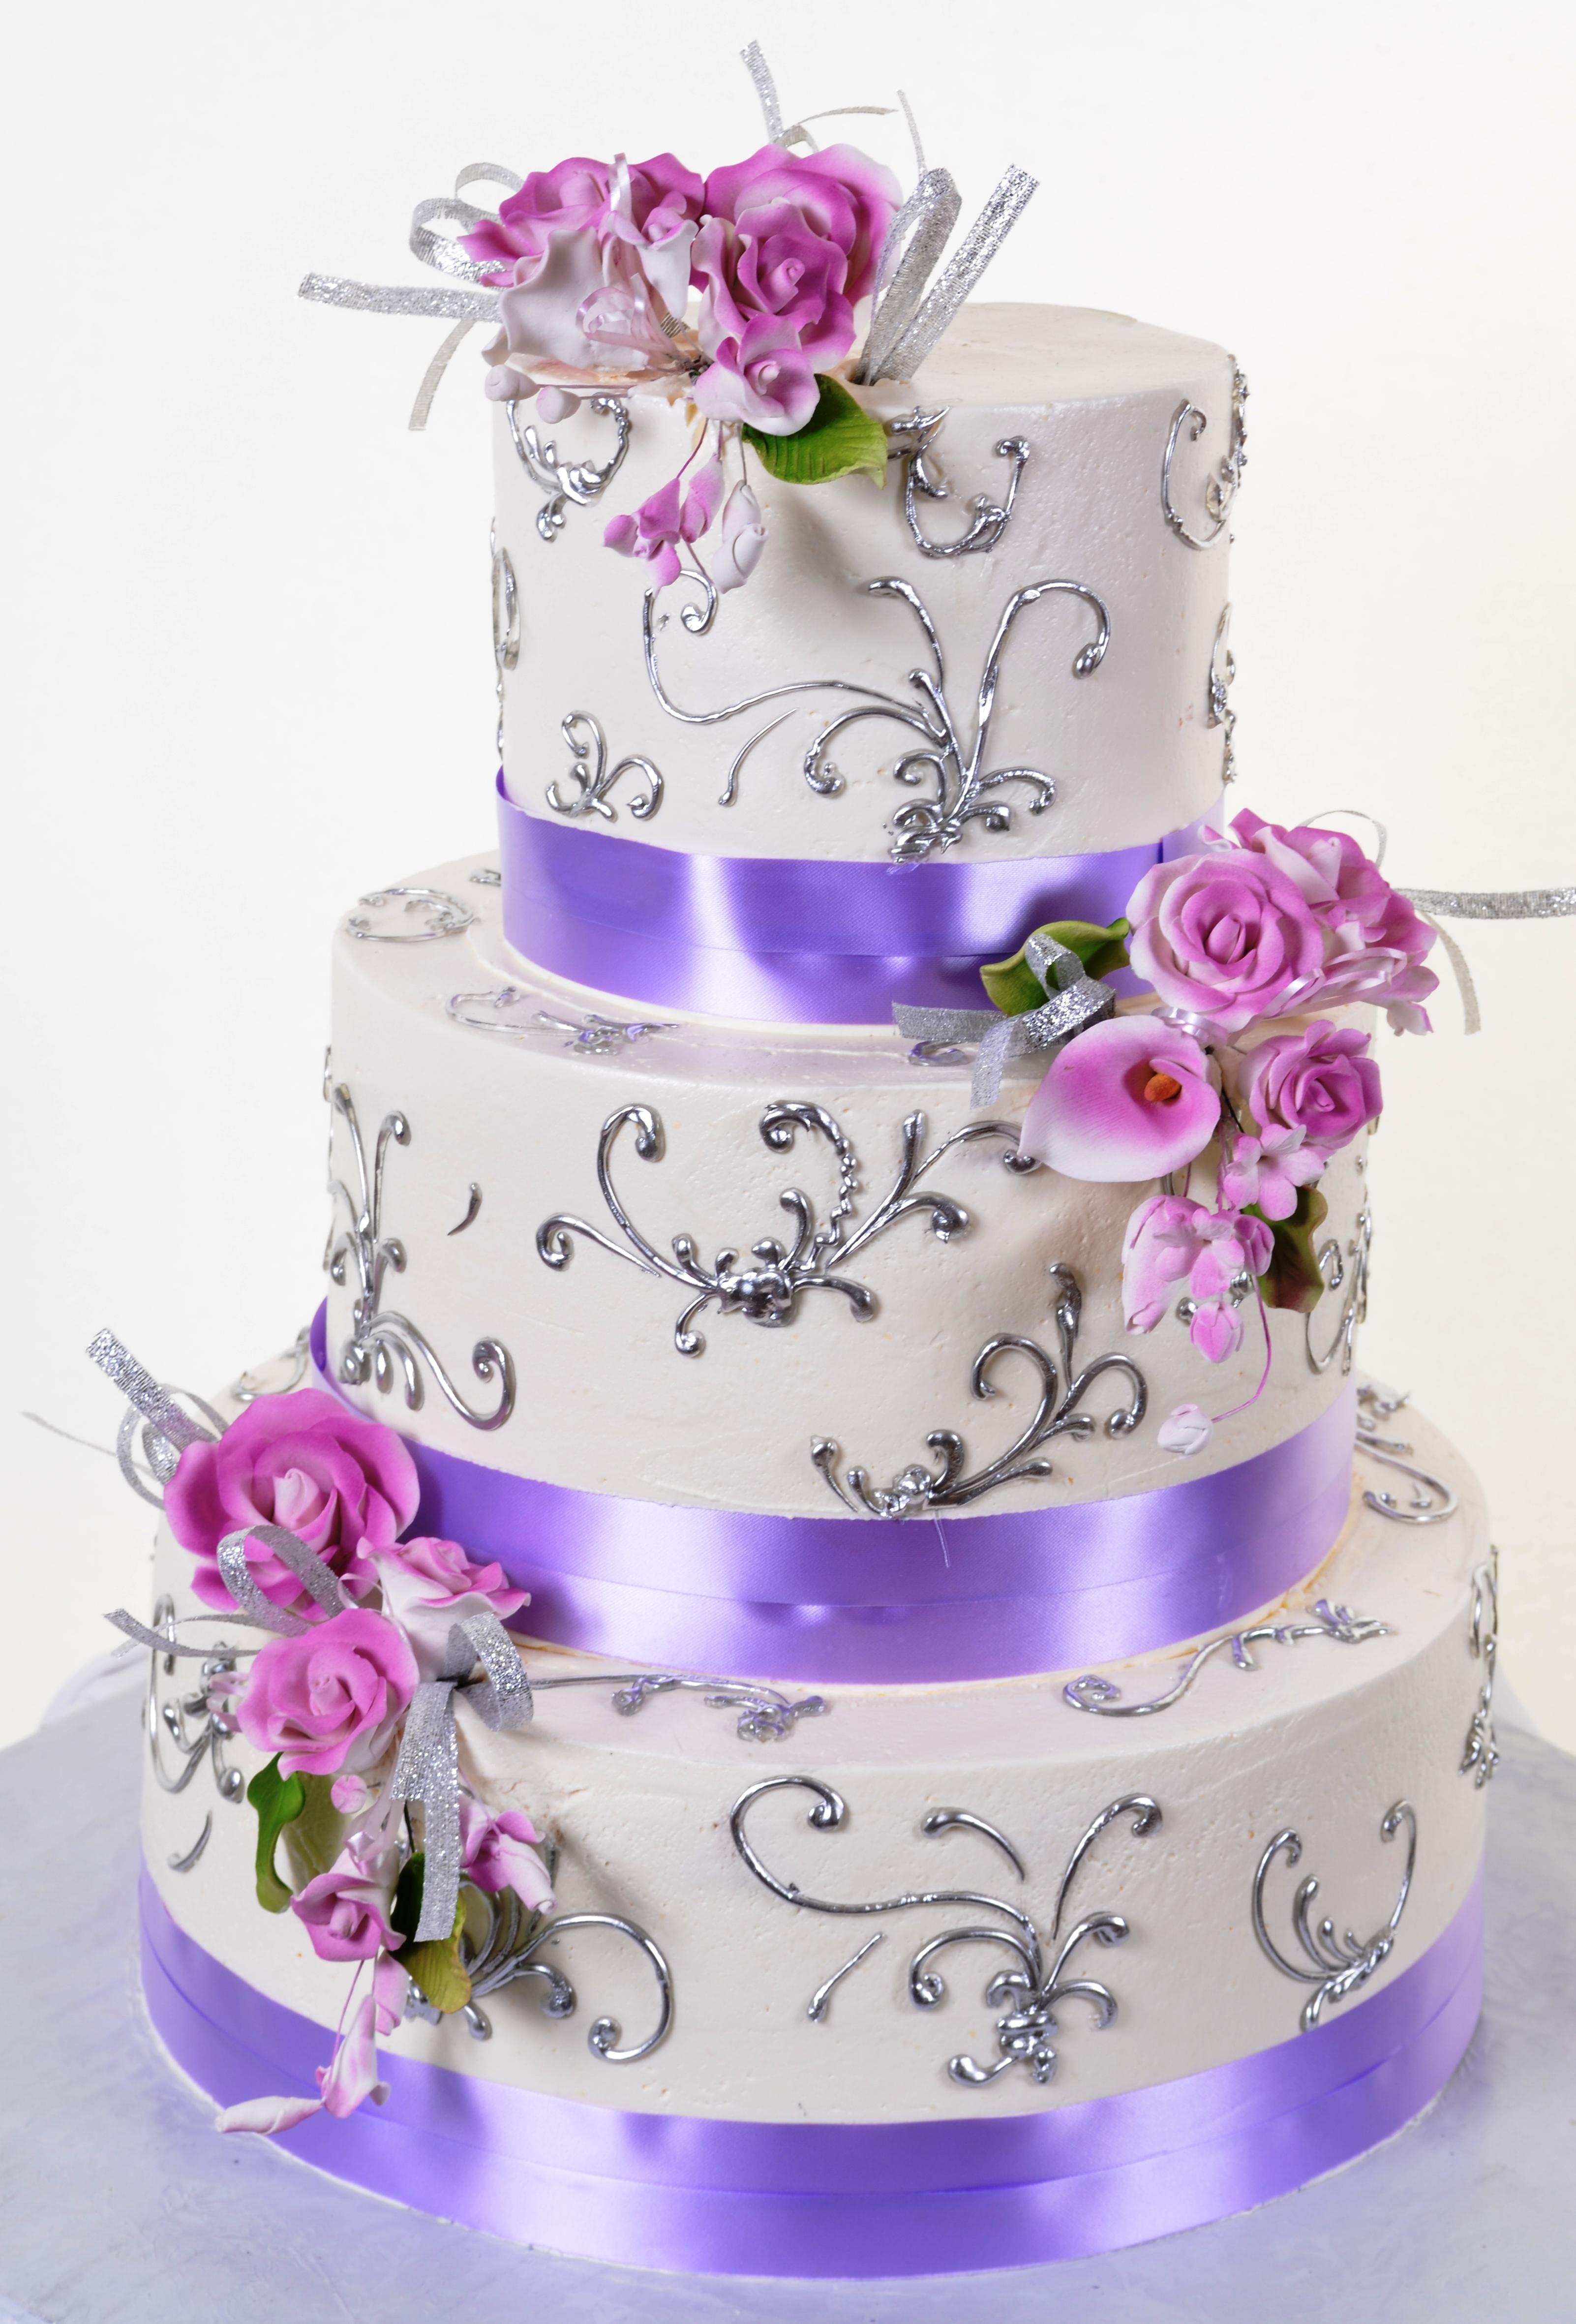 Pastry Palace Las Vegas Wedding Cake 908 - Lavender & Silver Dreams